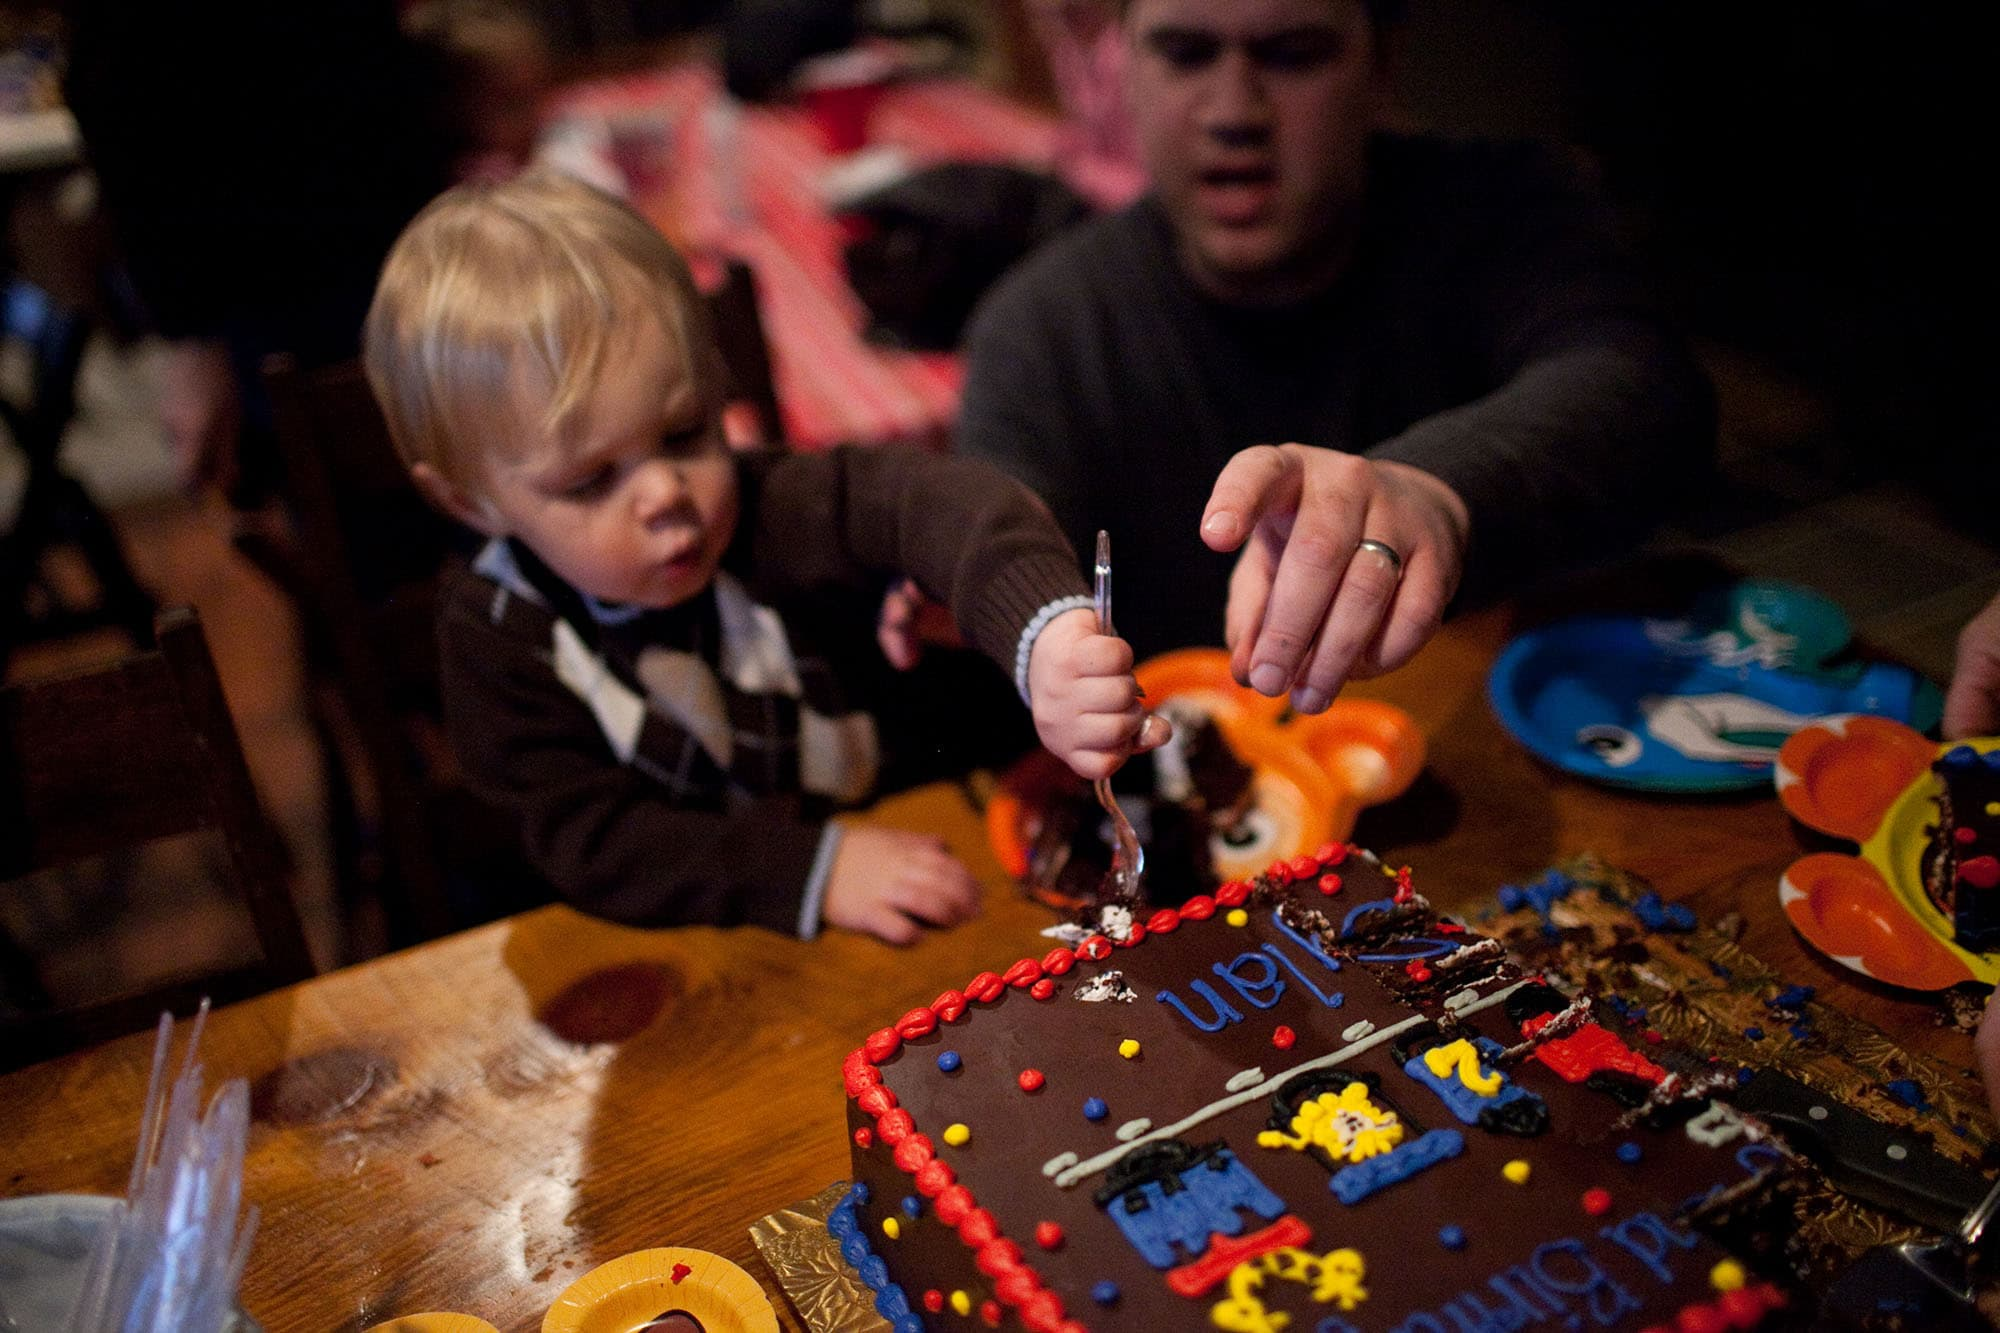 my nephew's second birthday party